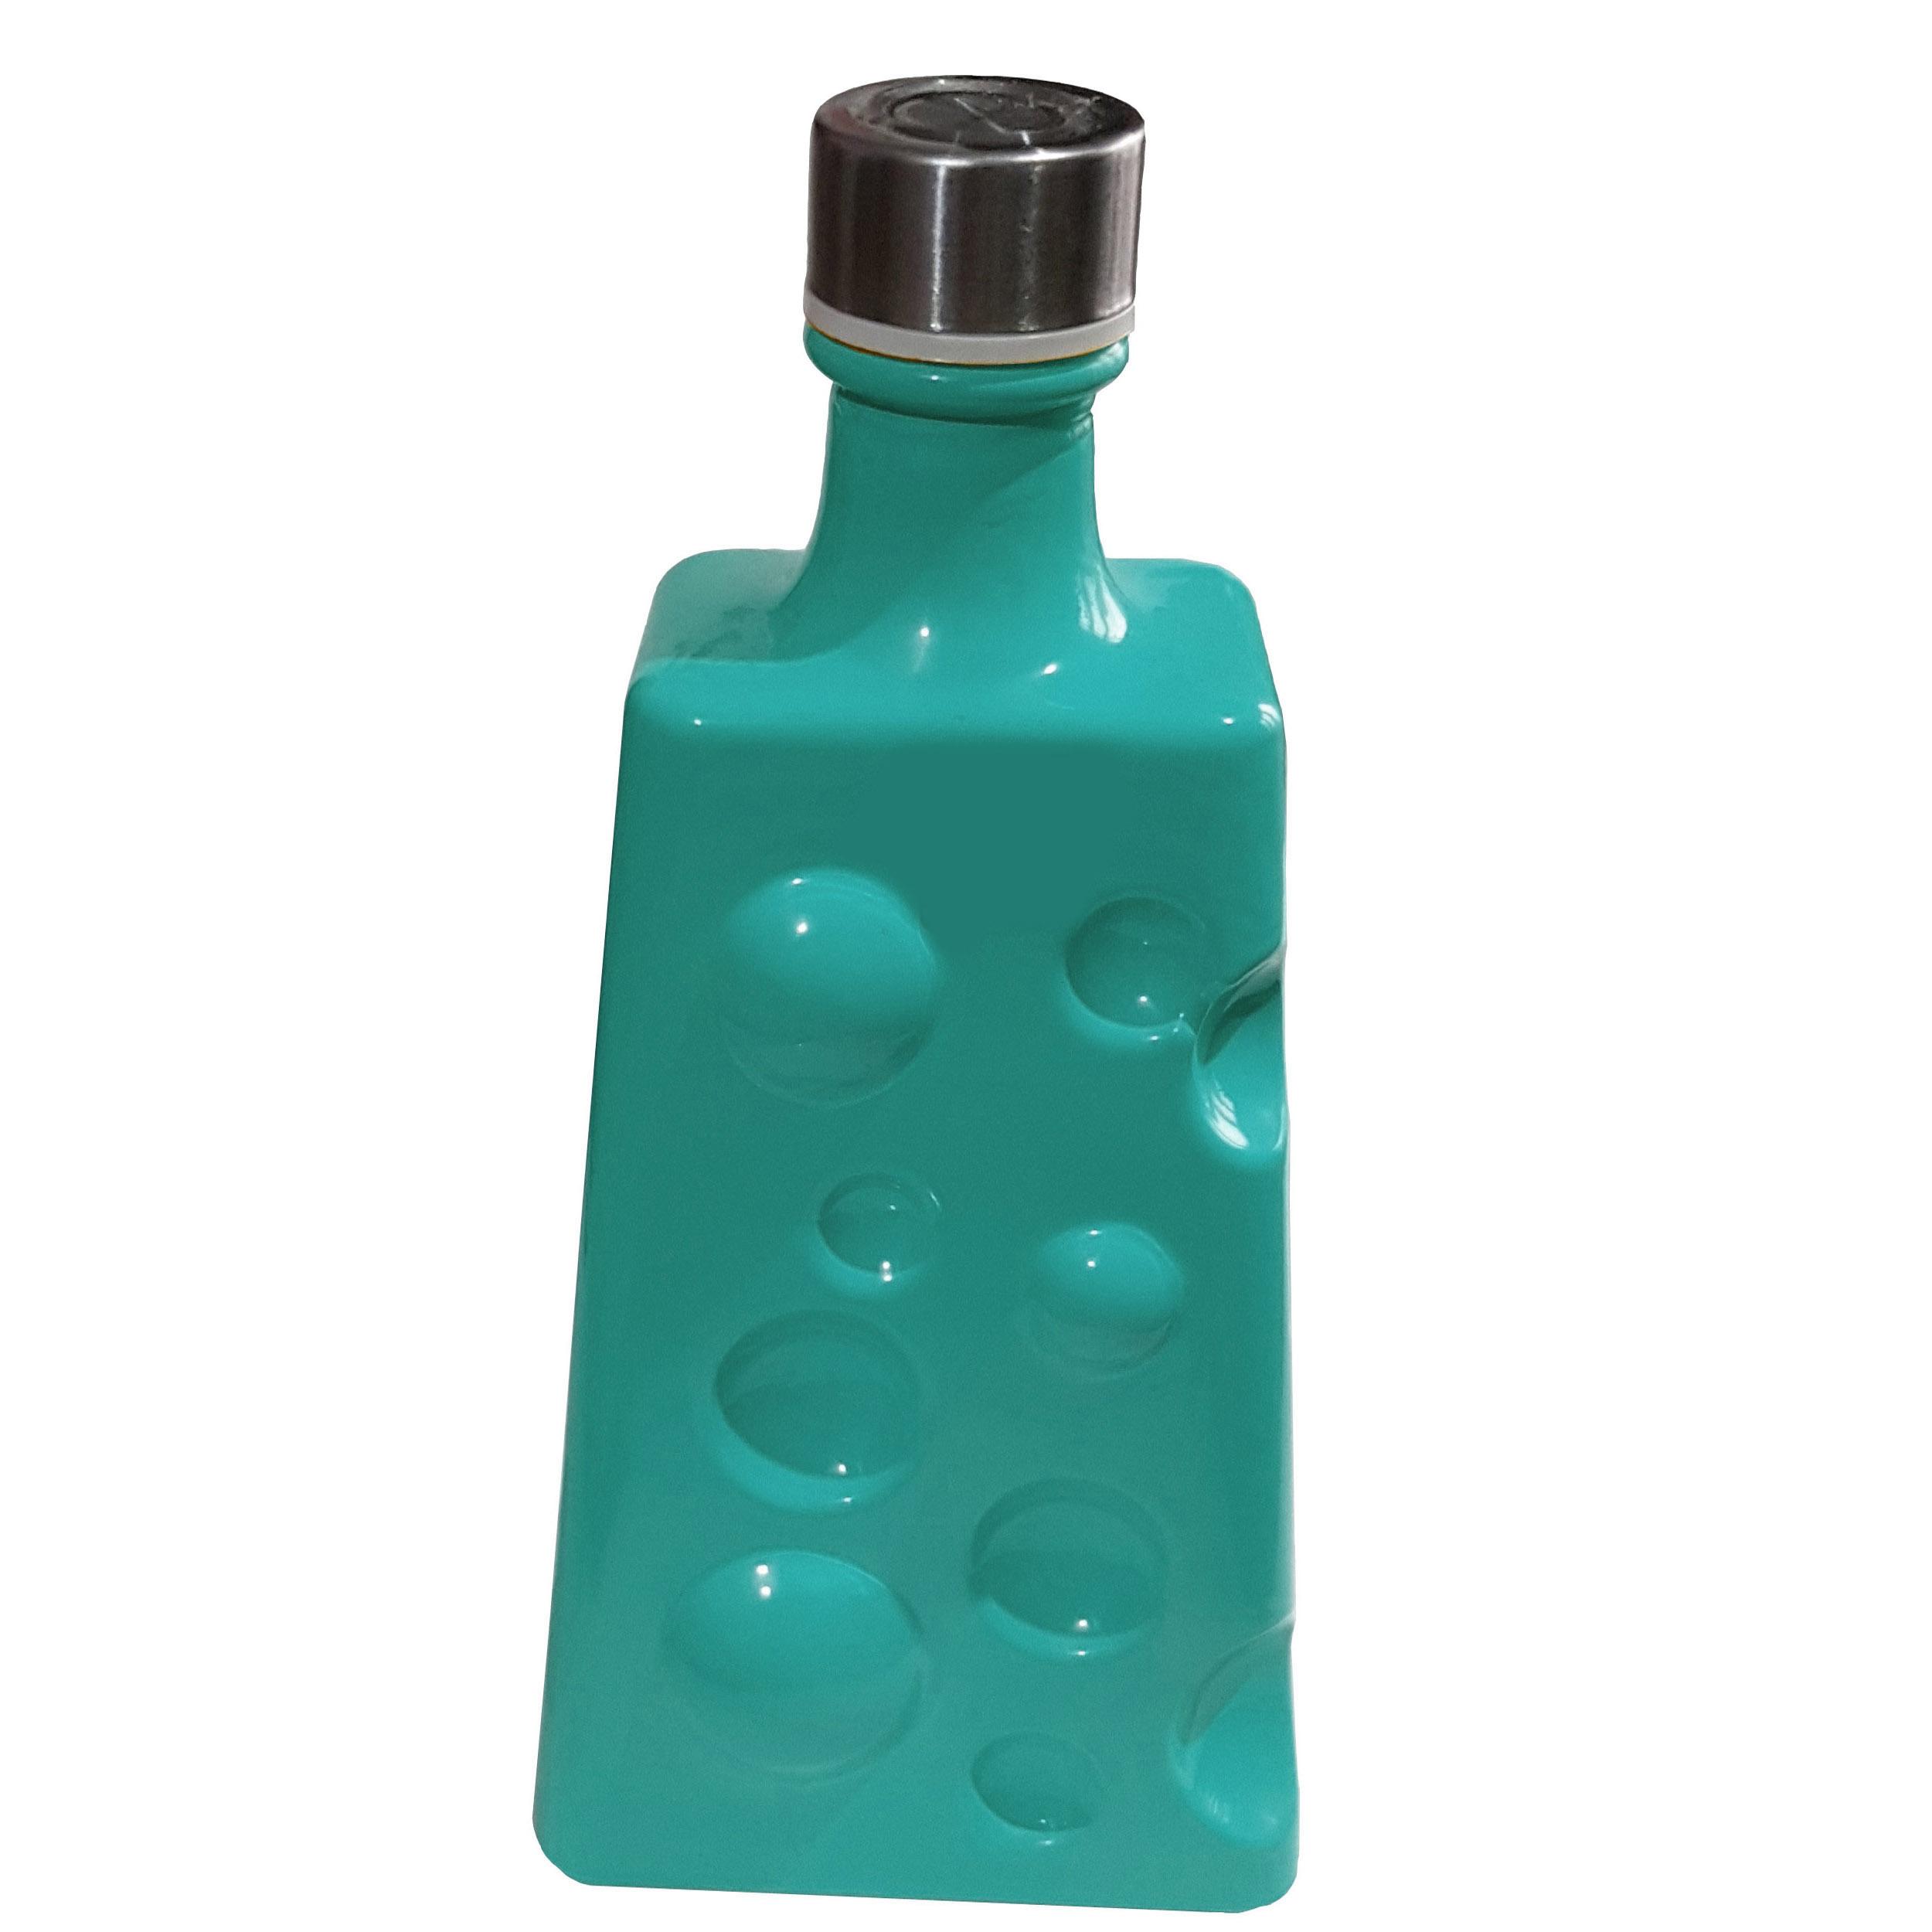 بطری آب طرح باب اسفنجی کدB-101